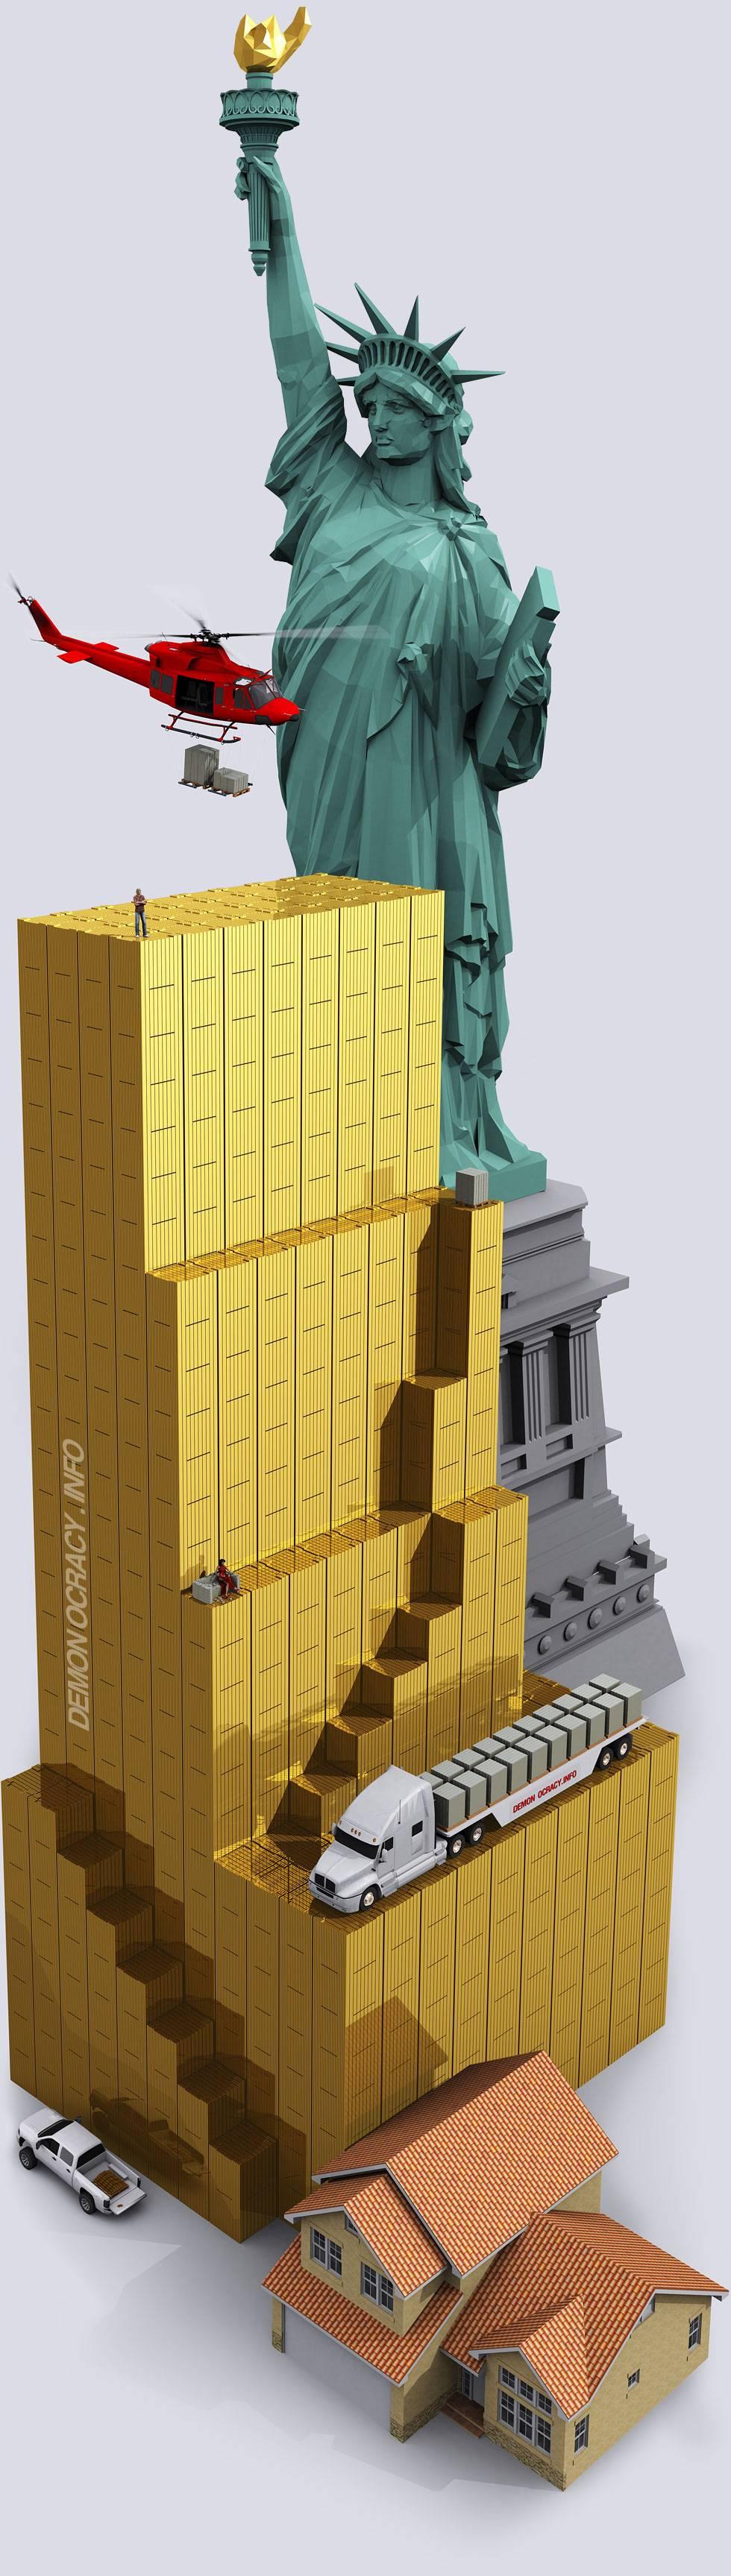 all-gold-in-world.jpg